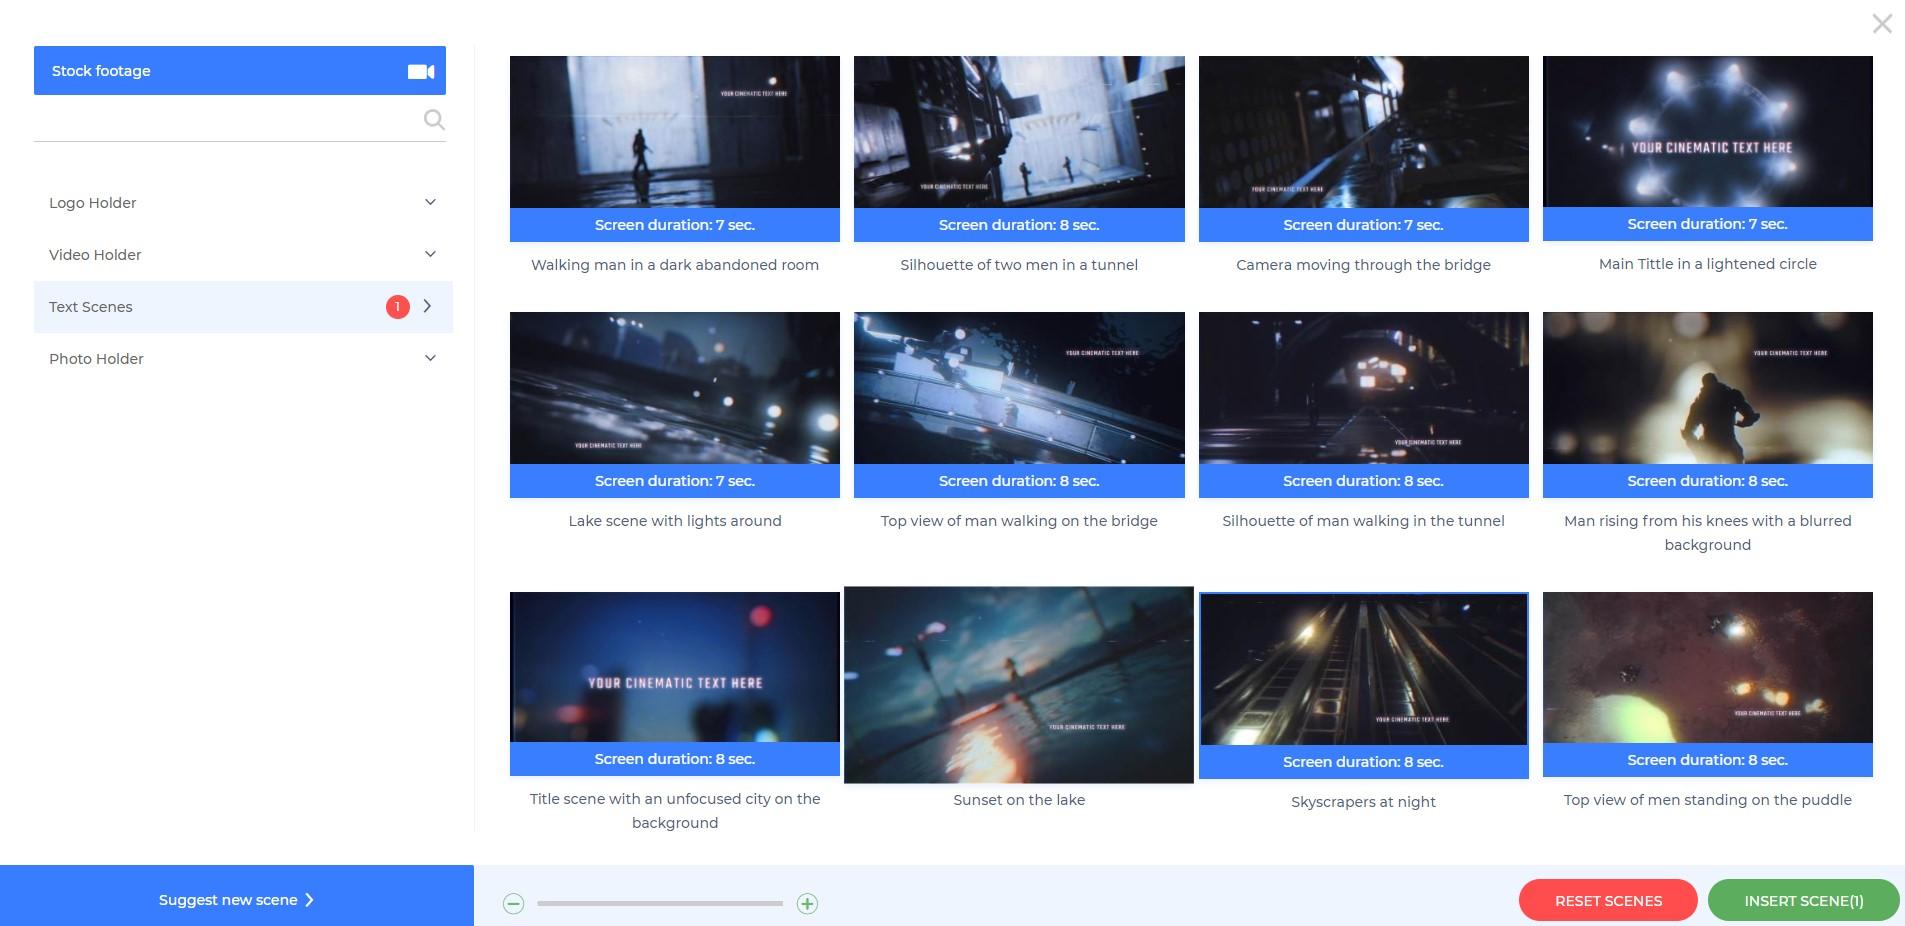 Cinematic Action Trailer - Scenes